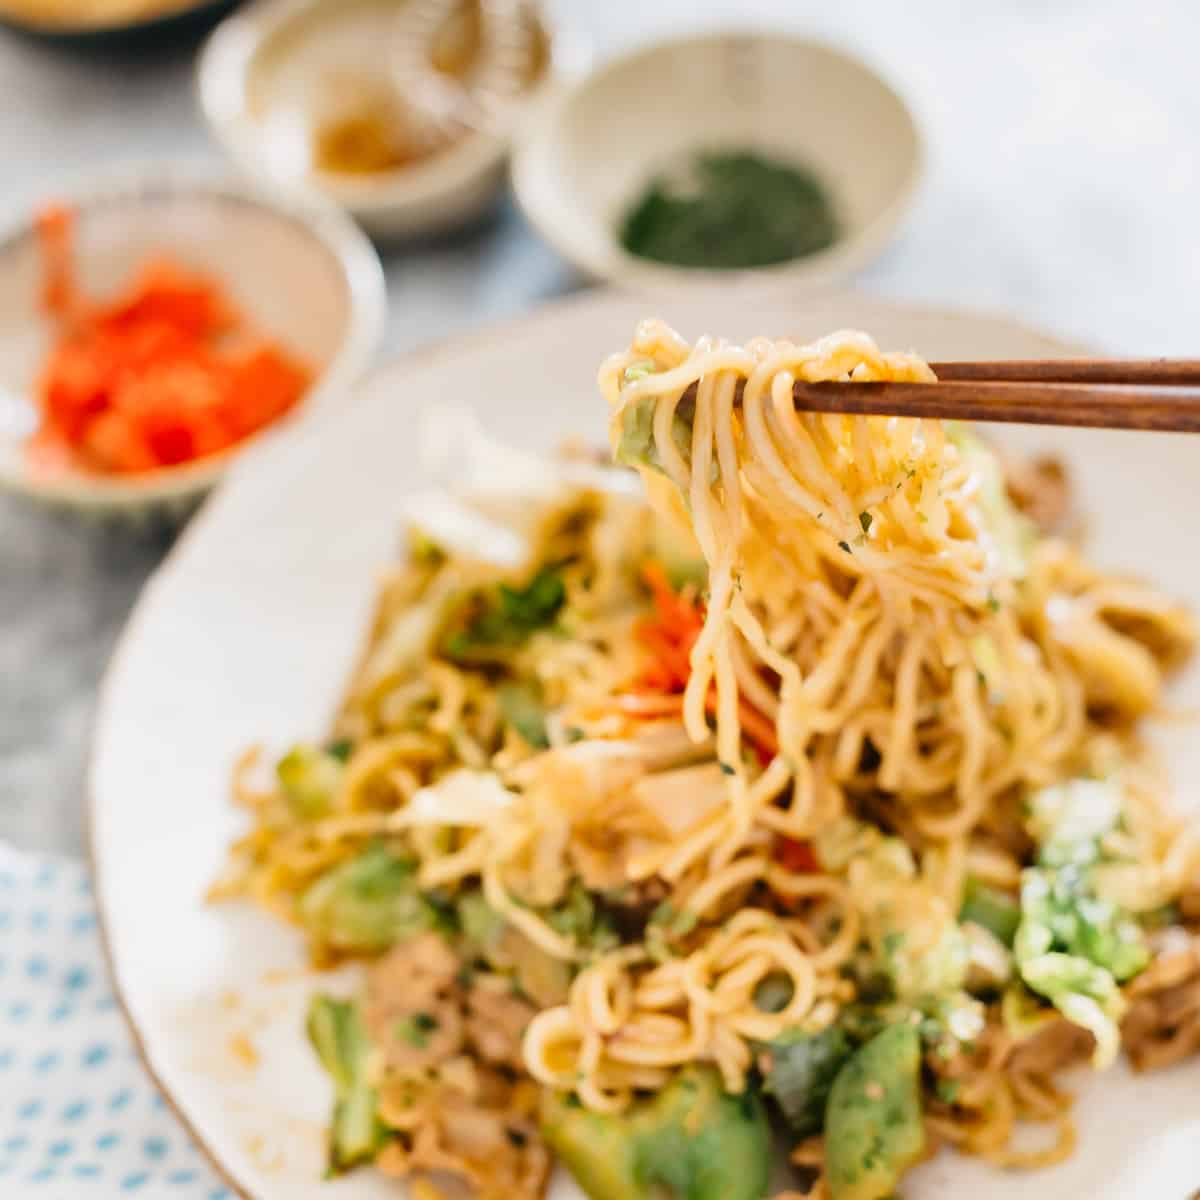 Yakisoba served on a plate, chopstick picking up noodles